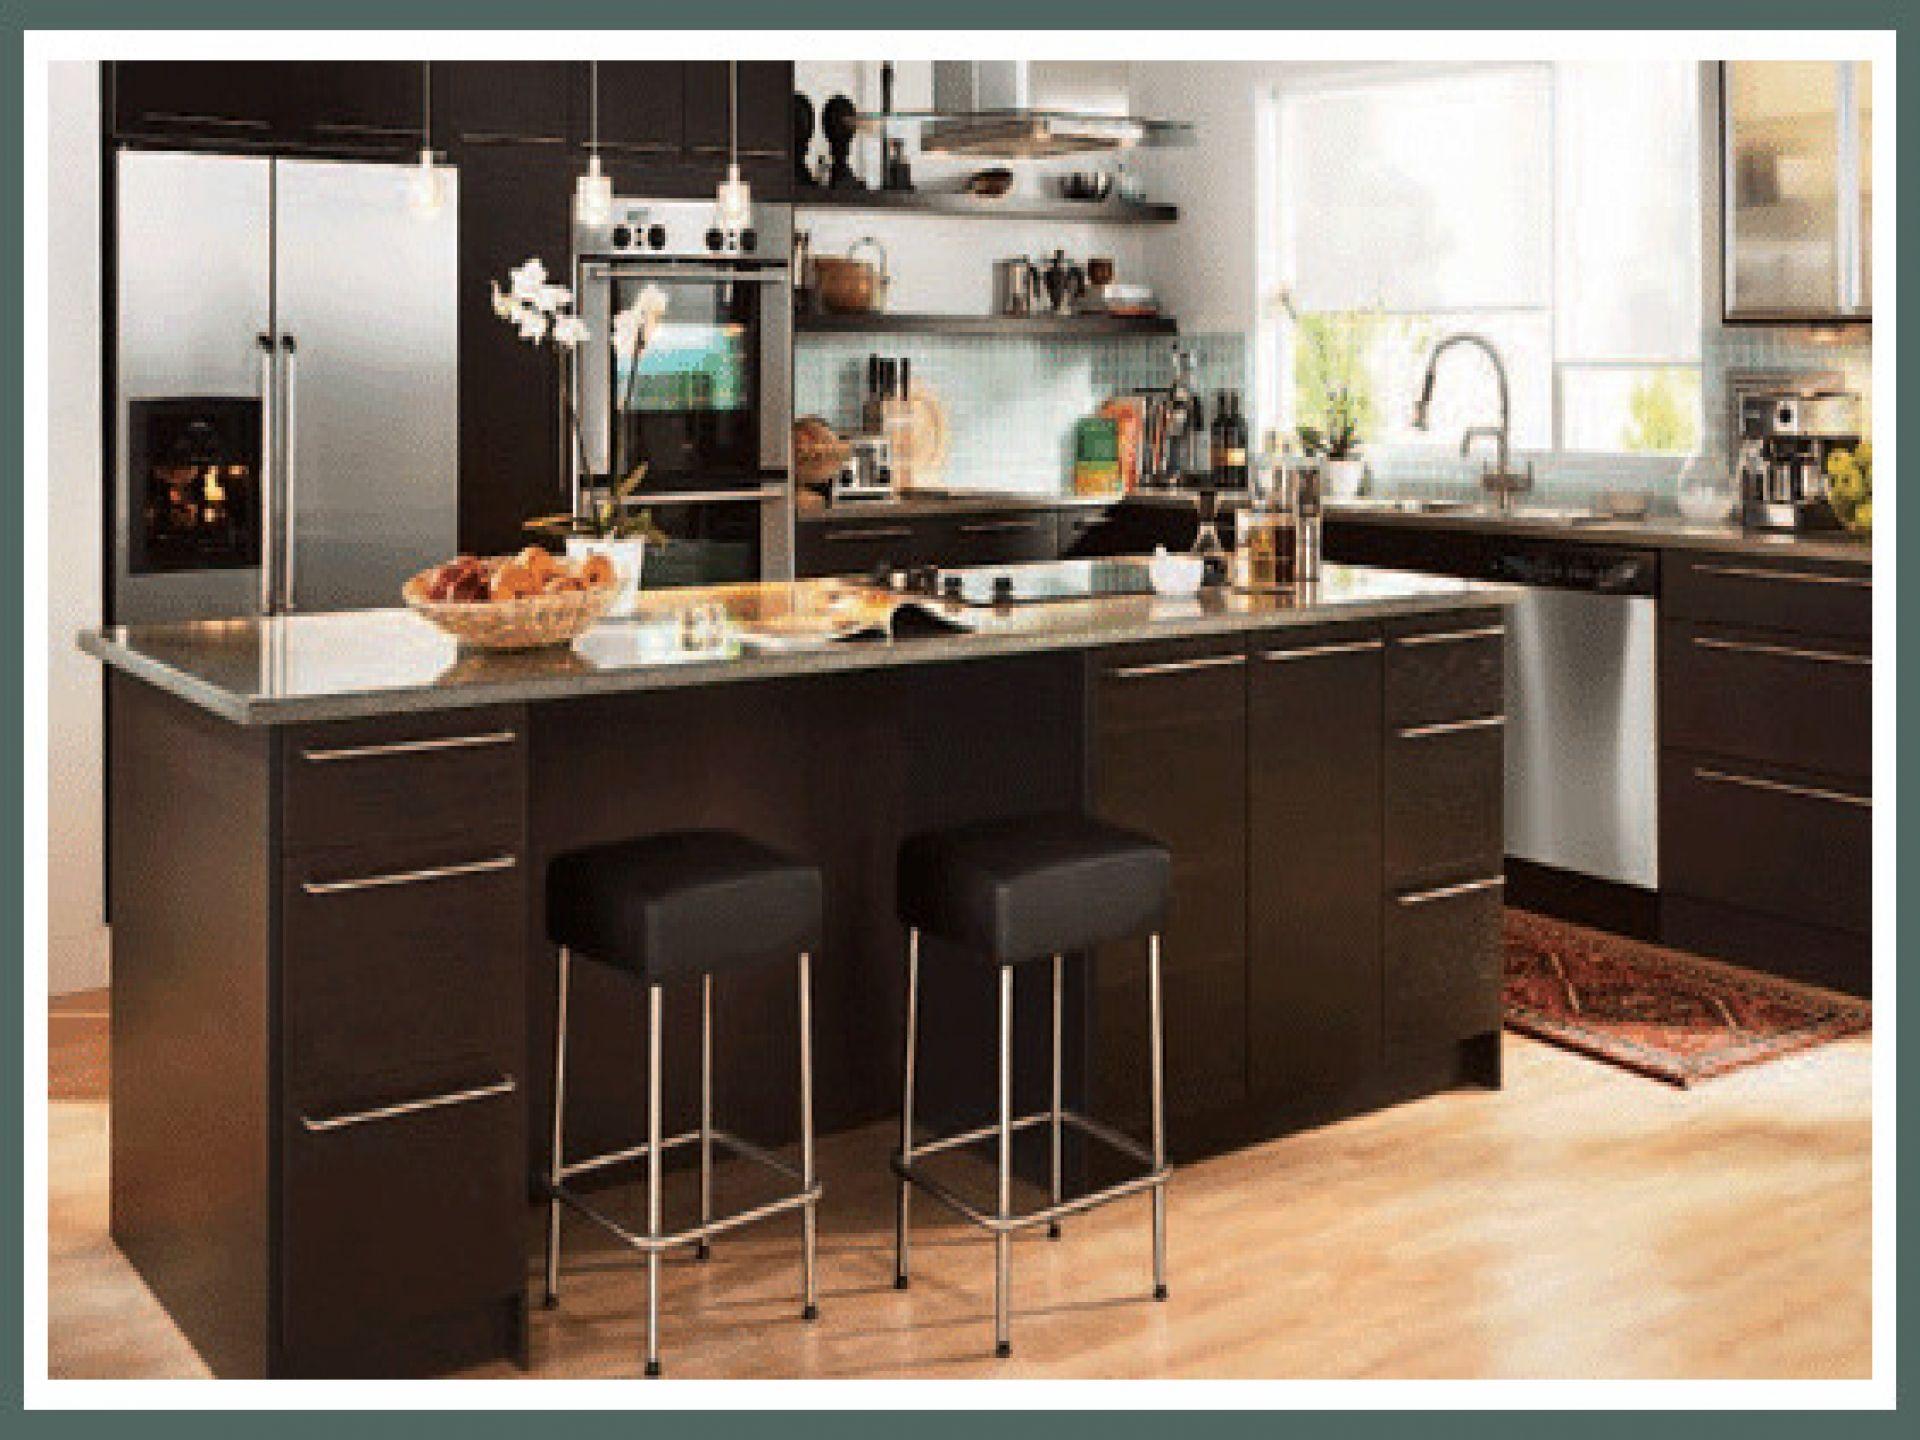 Kitchen Delightful Ikea Kitchen Planner Hard Wood Laminate Floor Delectable Kitchen Island Cabinet Design Decorating Inspiration